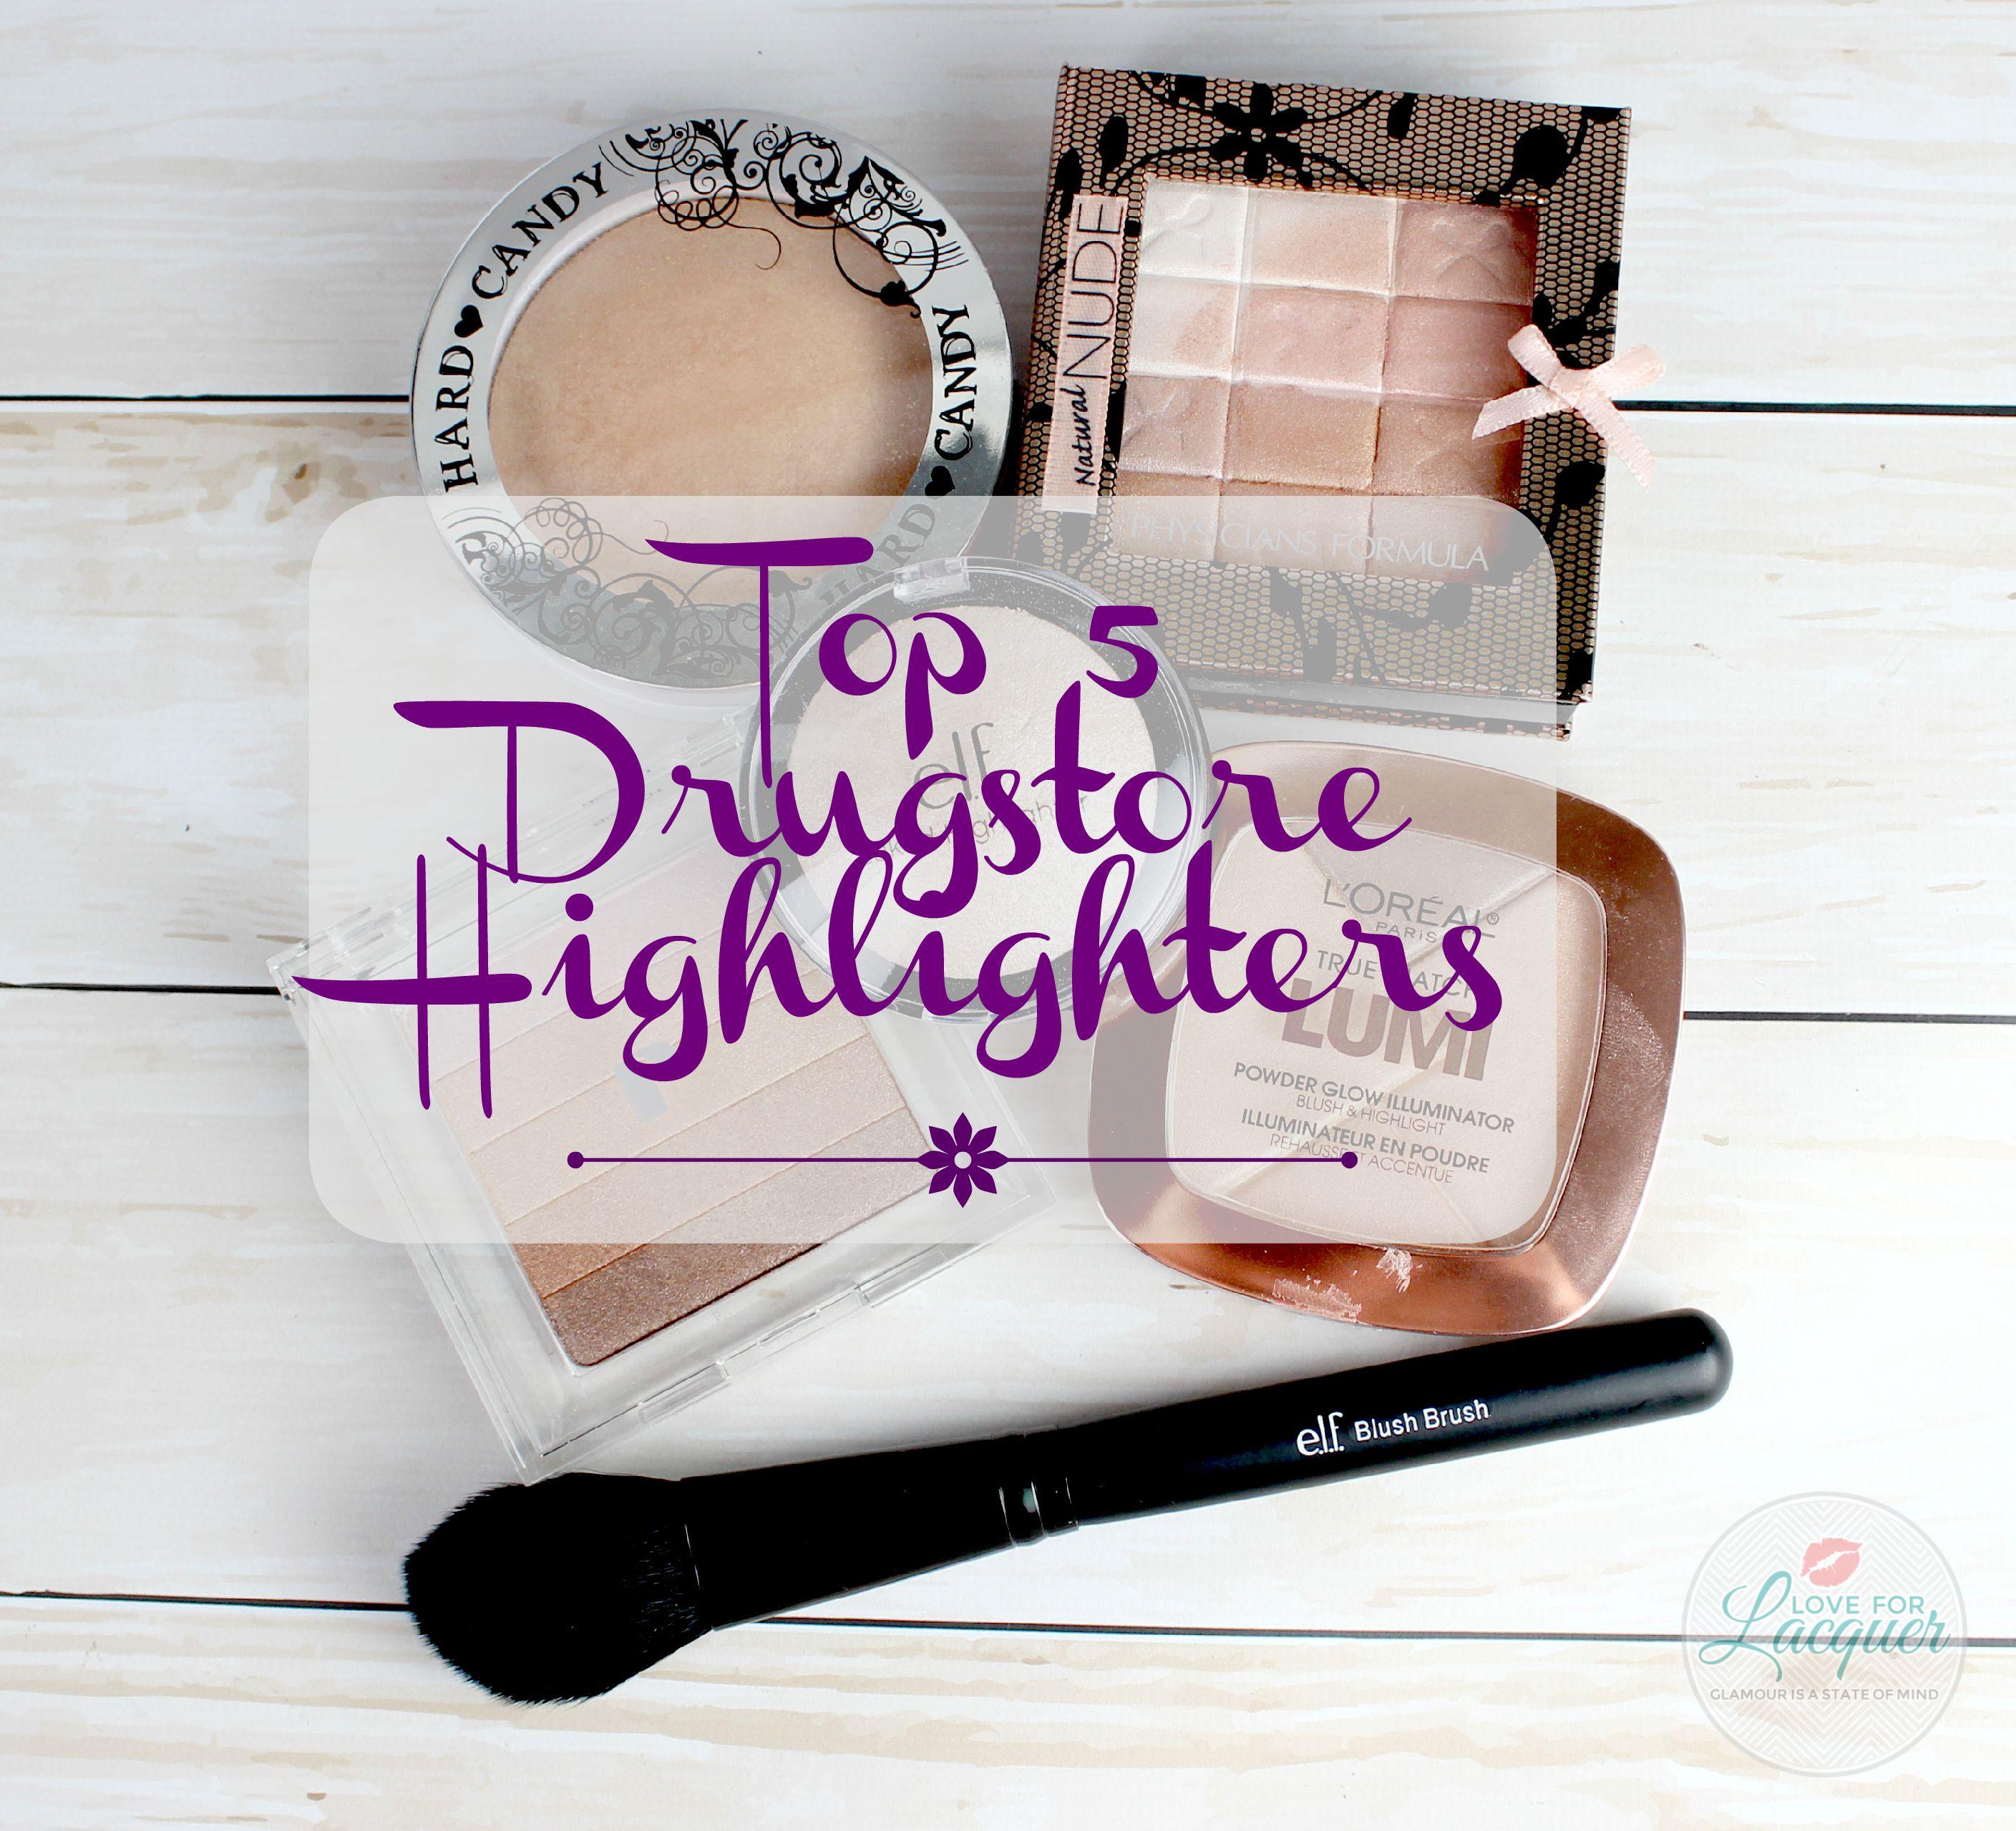 DrugstoreHighlightHero